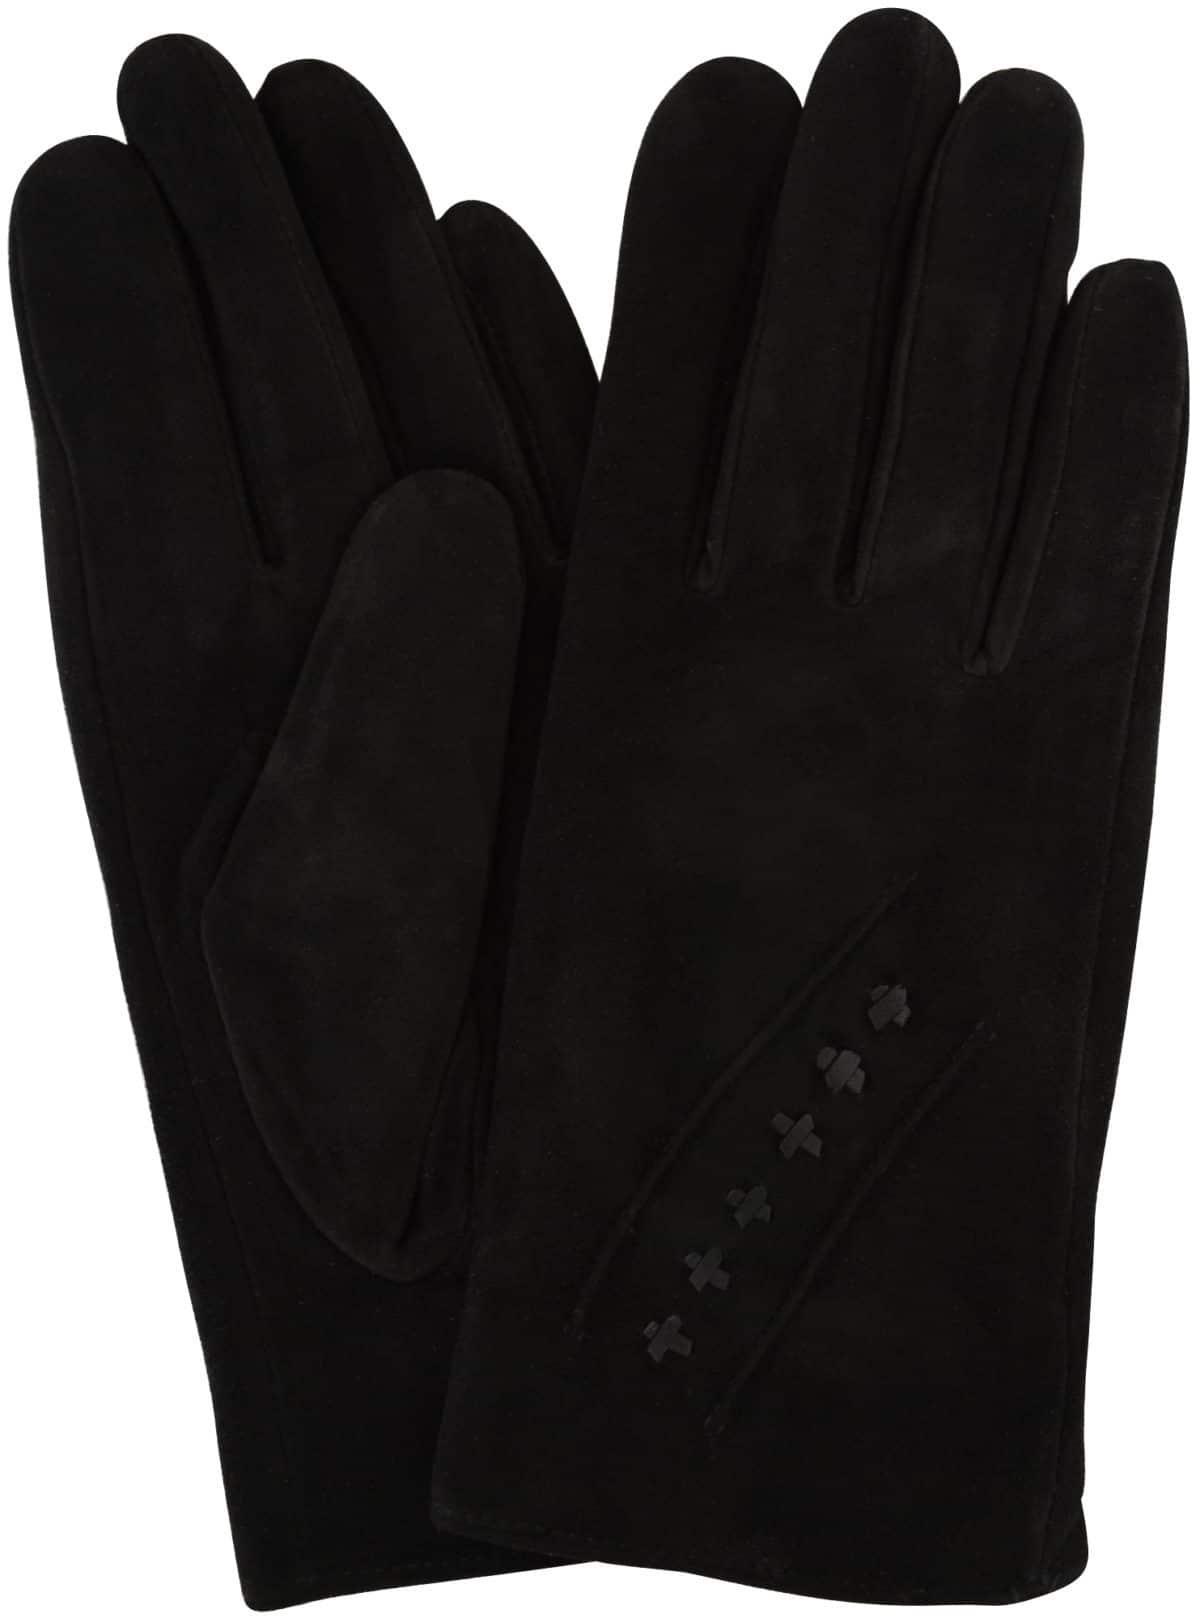 Suede Gloves Fleece Lining and Stitch Design - Black